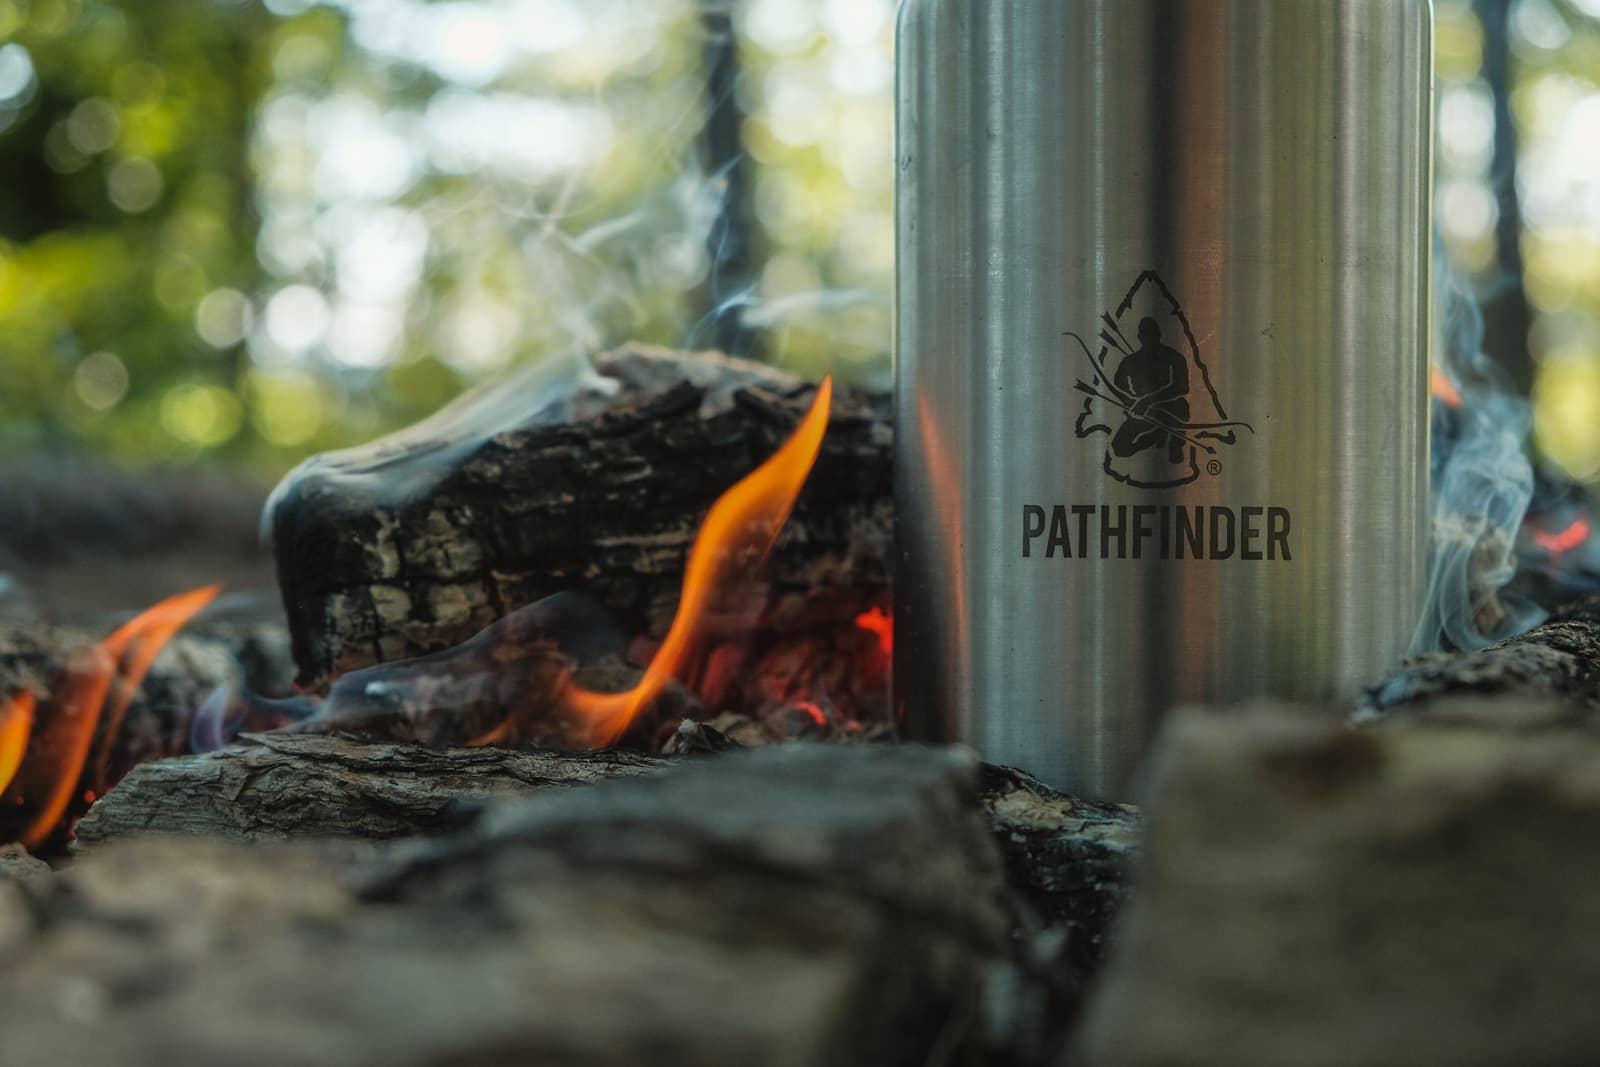 Pathfinder SS 32 oz. Bottle-Cup